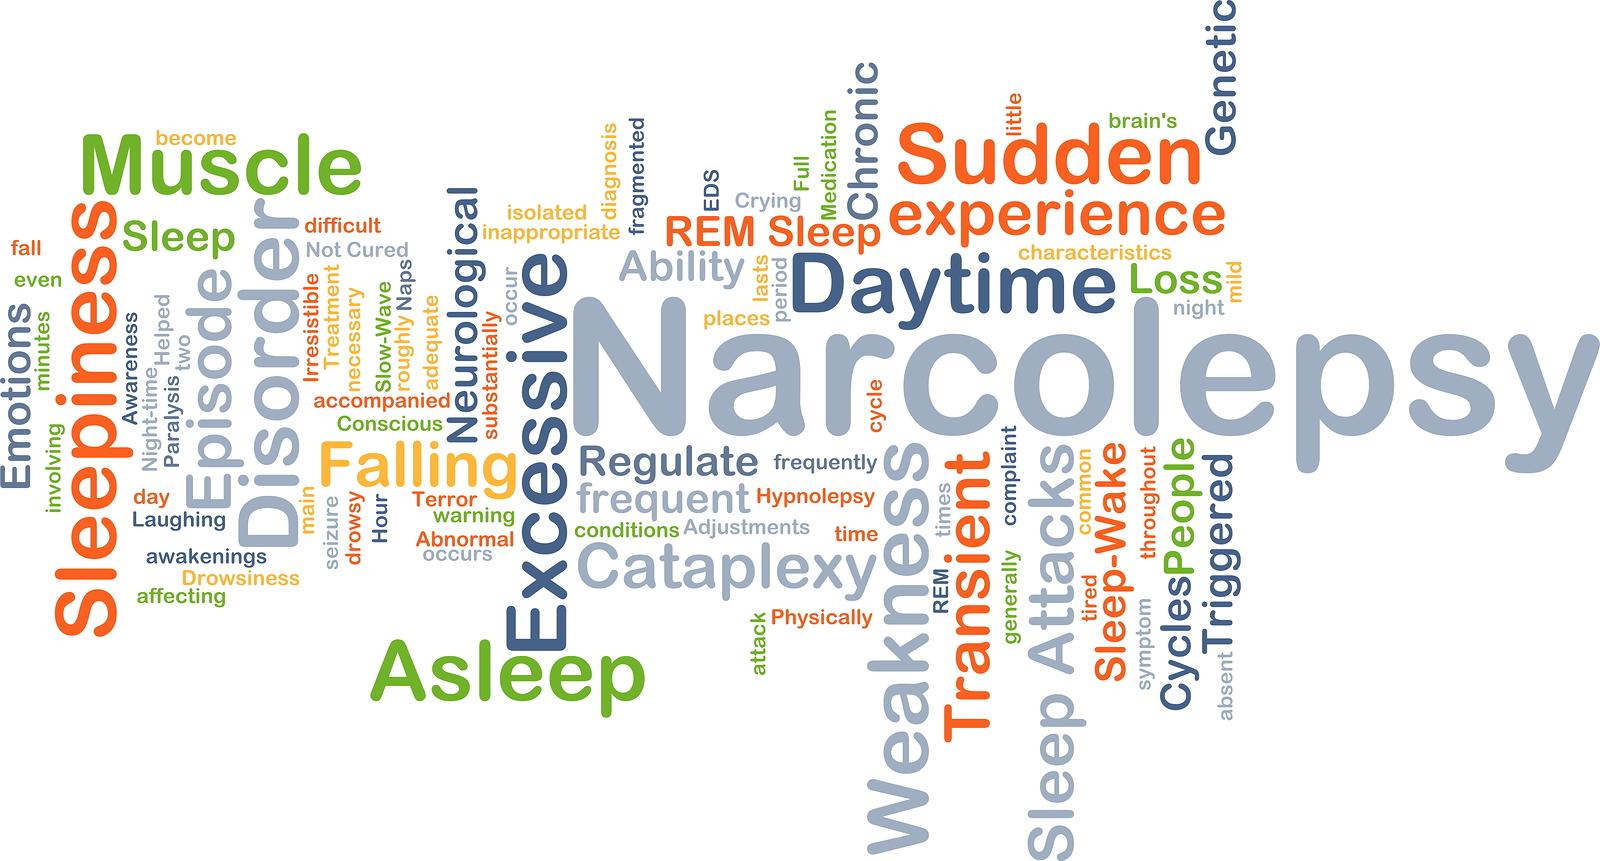 9 Facts About Narcolepsy - Sleep Disorders - Sleep Apnea